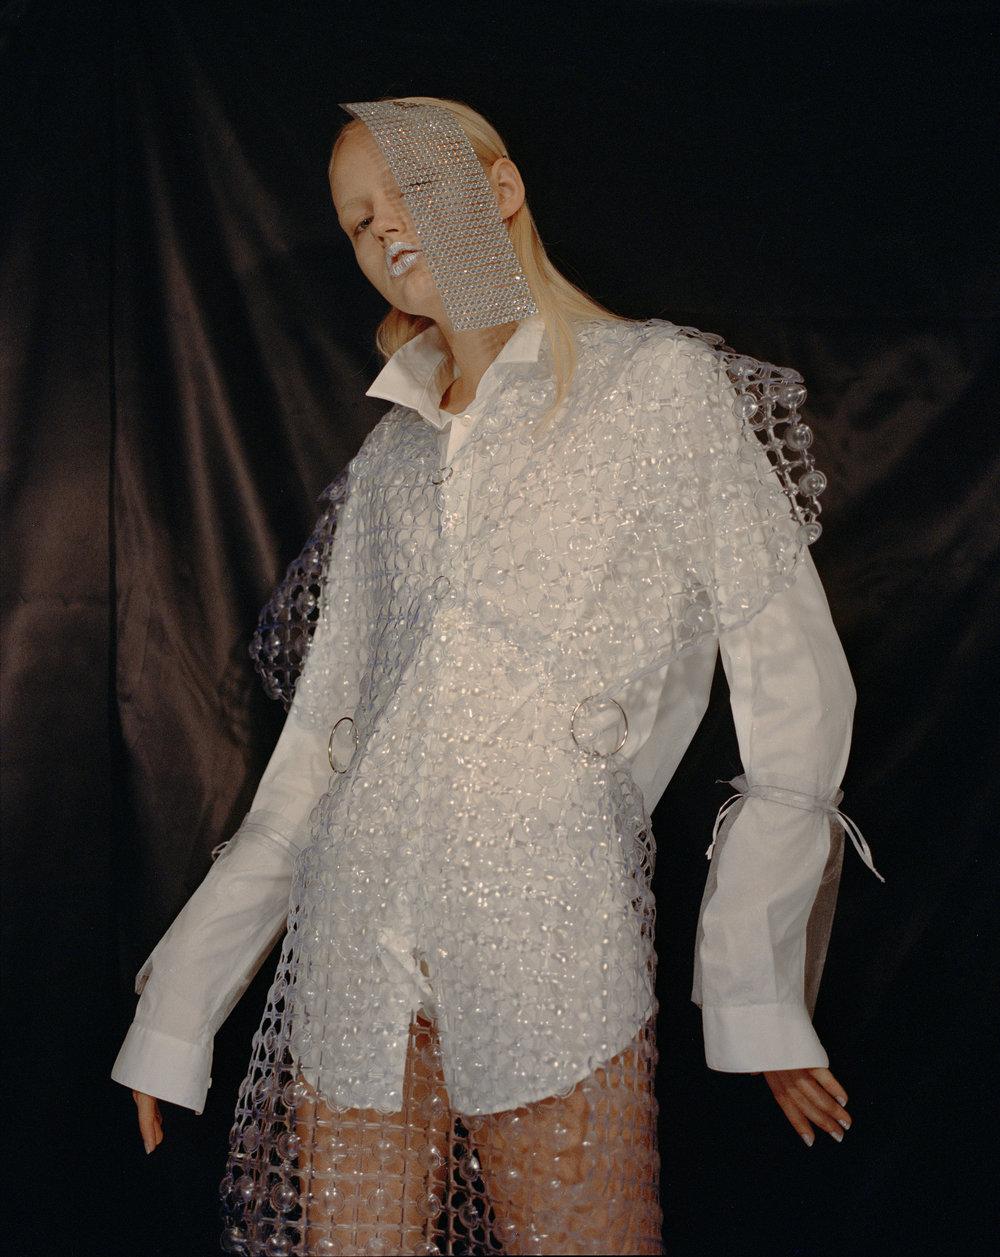 shirt MAISON MARTIN MARGIELArest of look CHEYUAN LEE